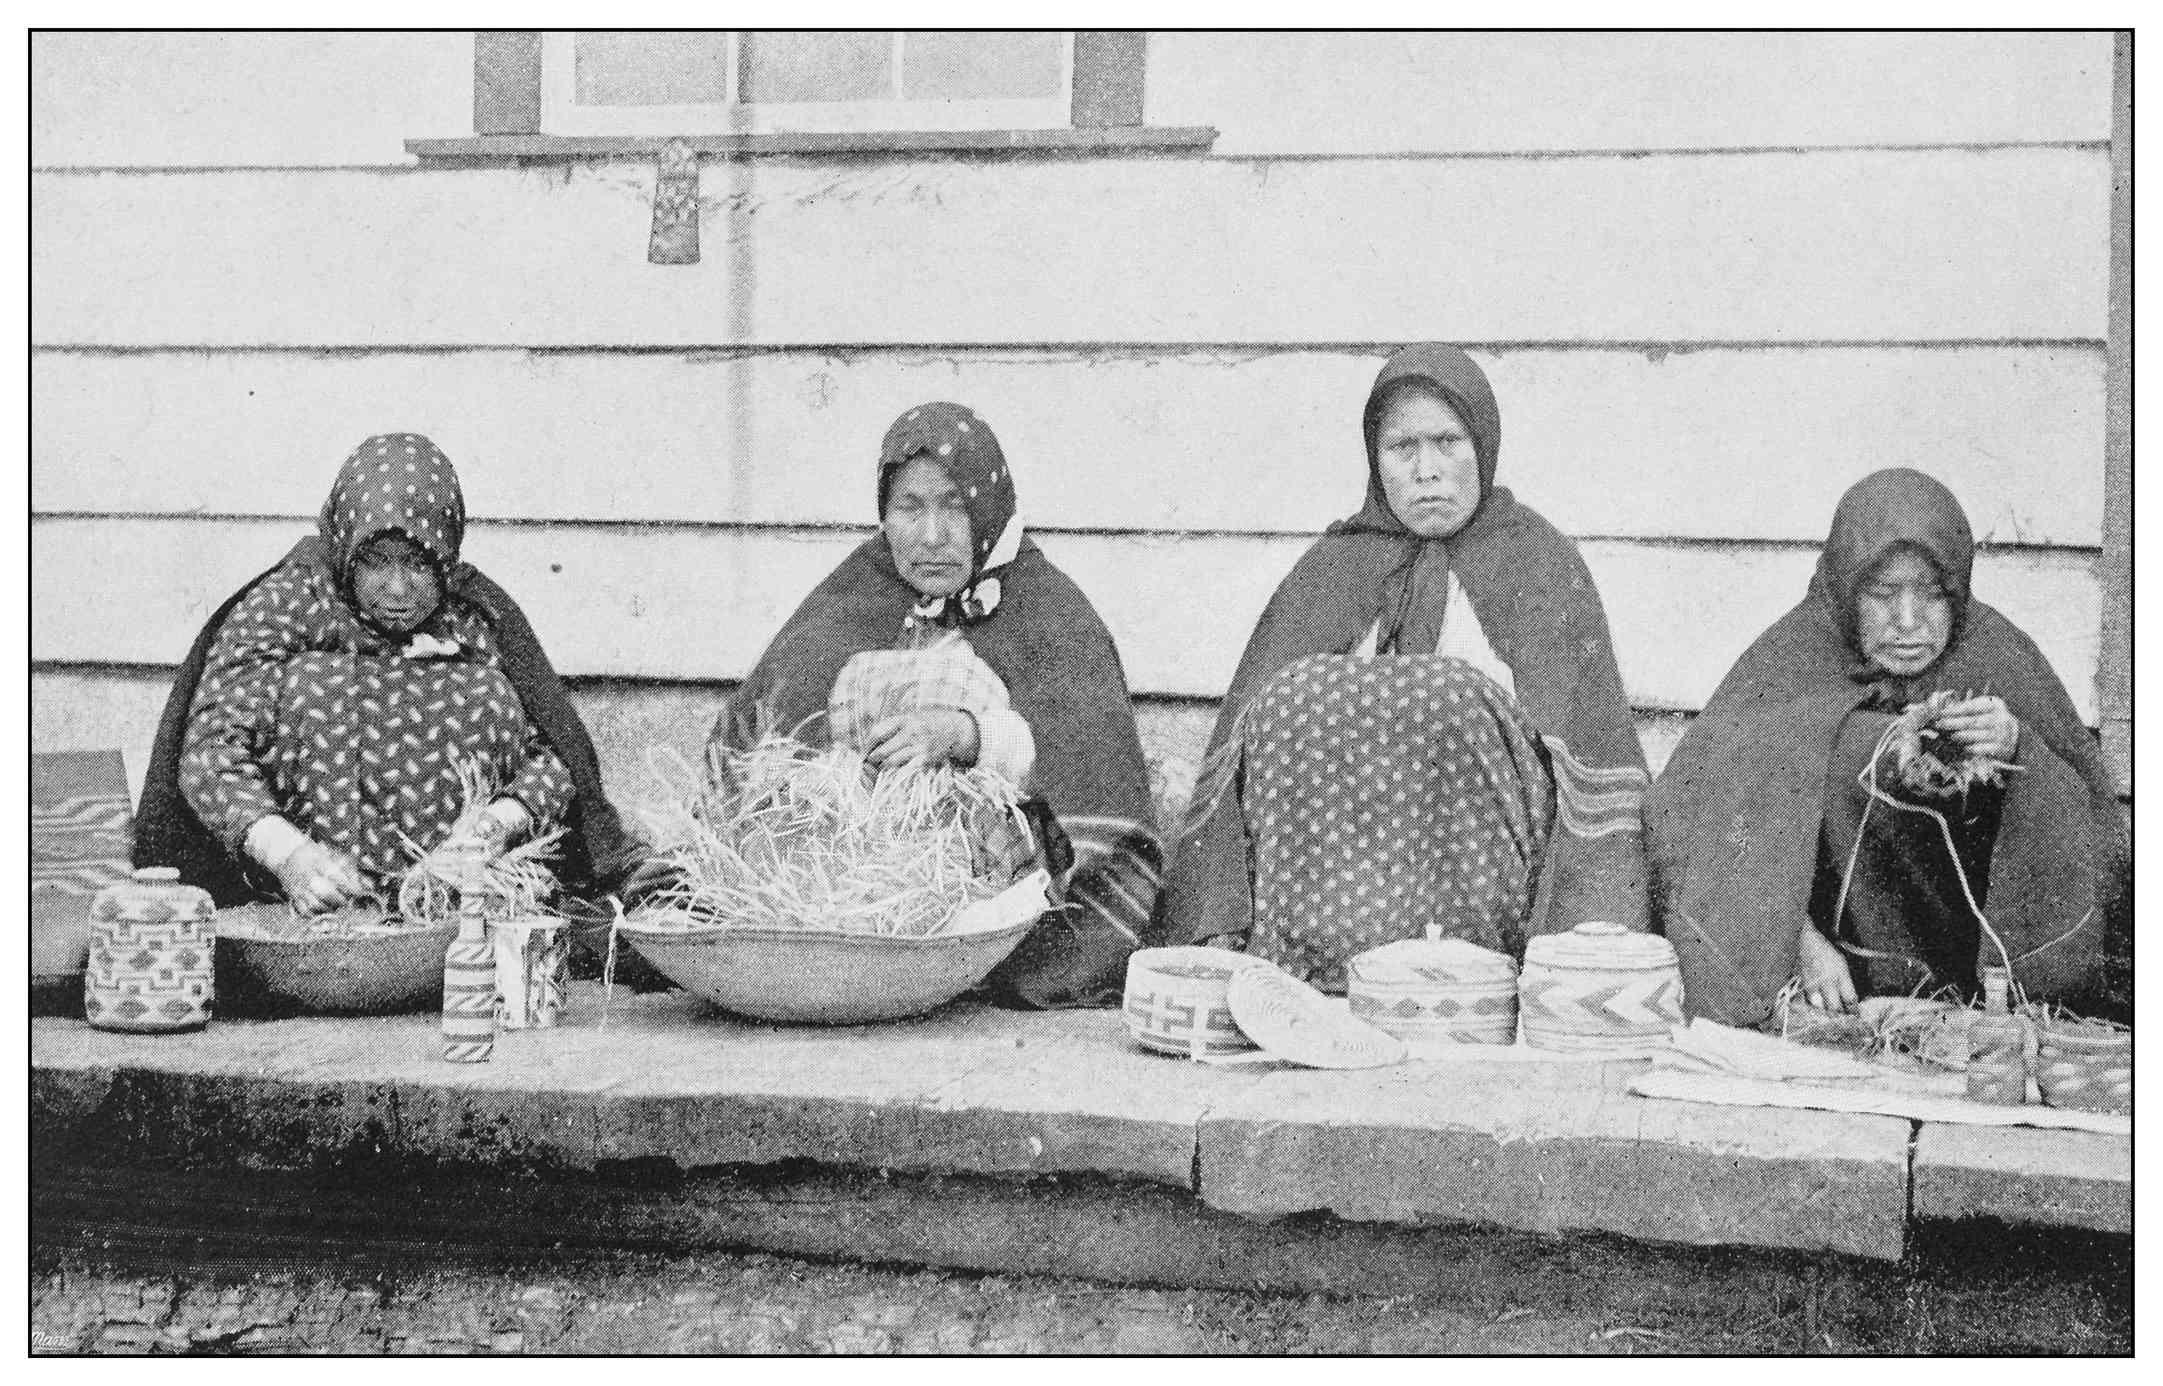 Indigenous basket weavers, Sitka, Alaska